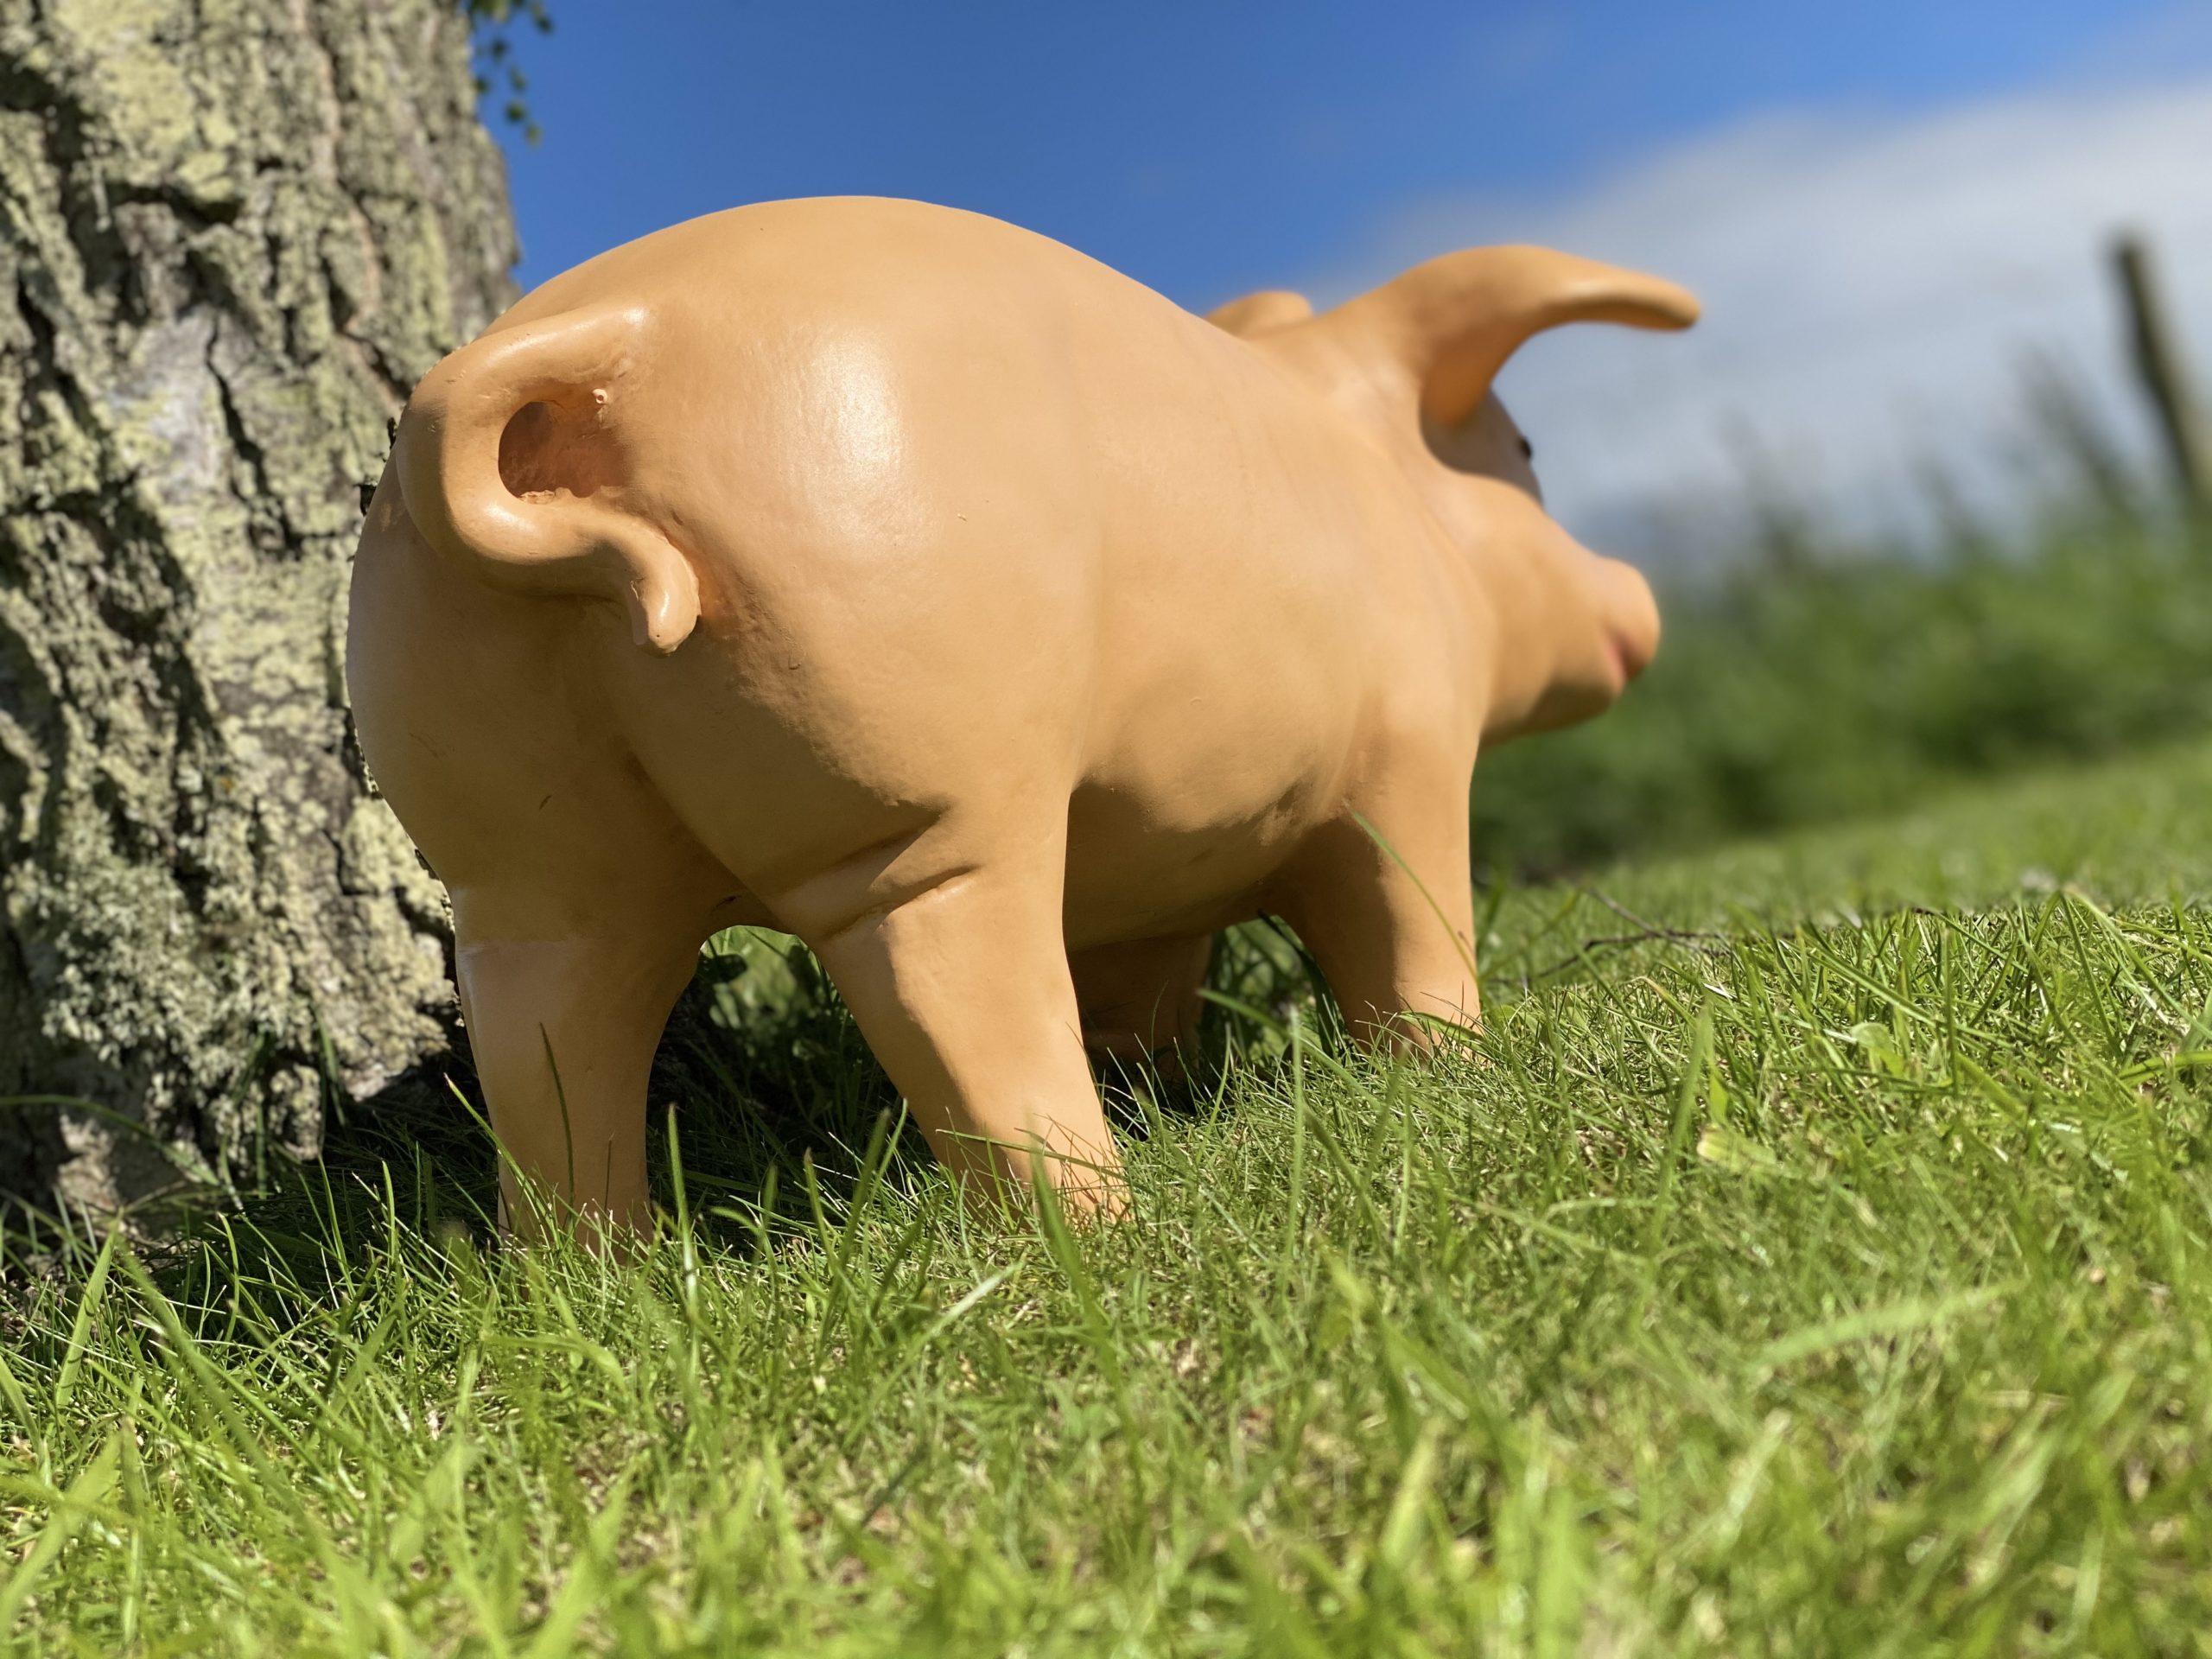 Life Size Fibreglass Piglet 3D Model beside tree